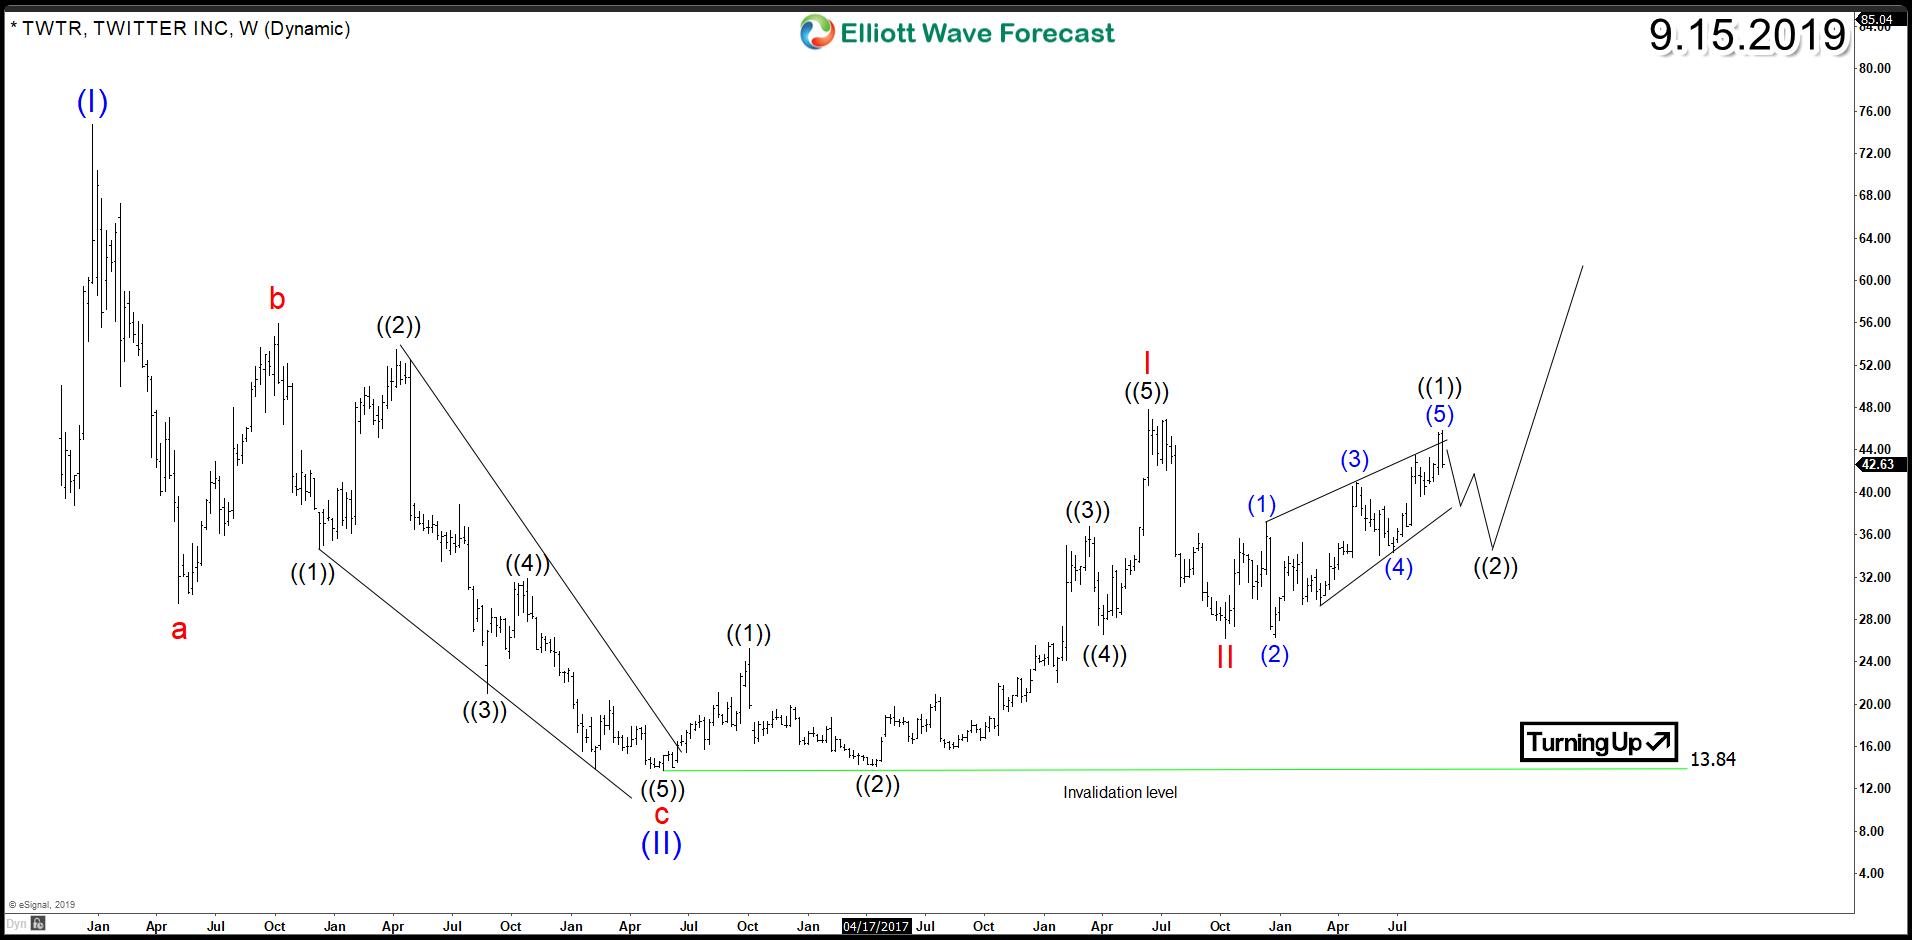 Twitter (NYSE: TWTR) Impulsive Elliott Wave Structure